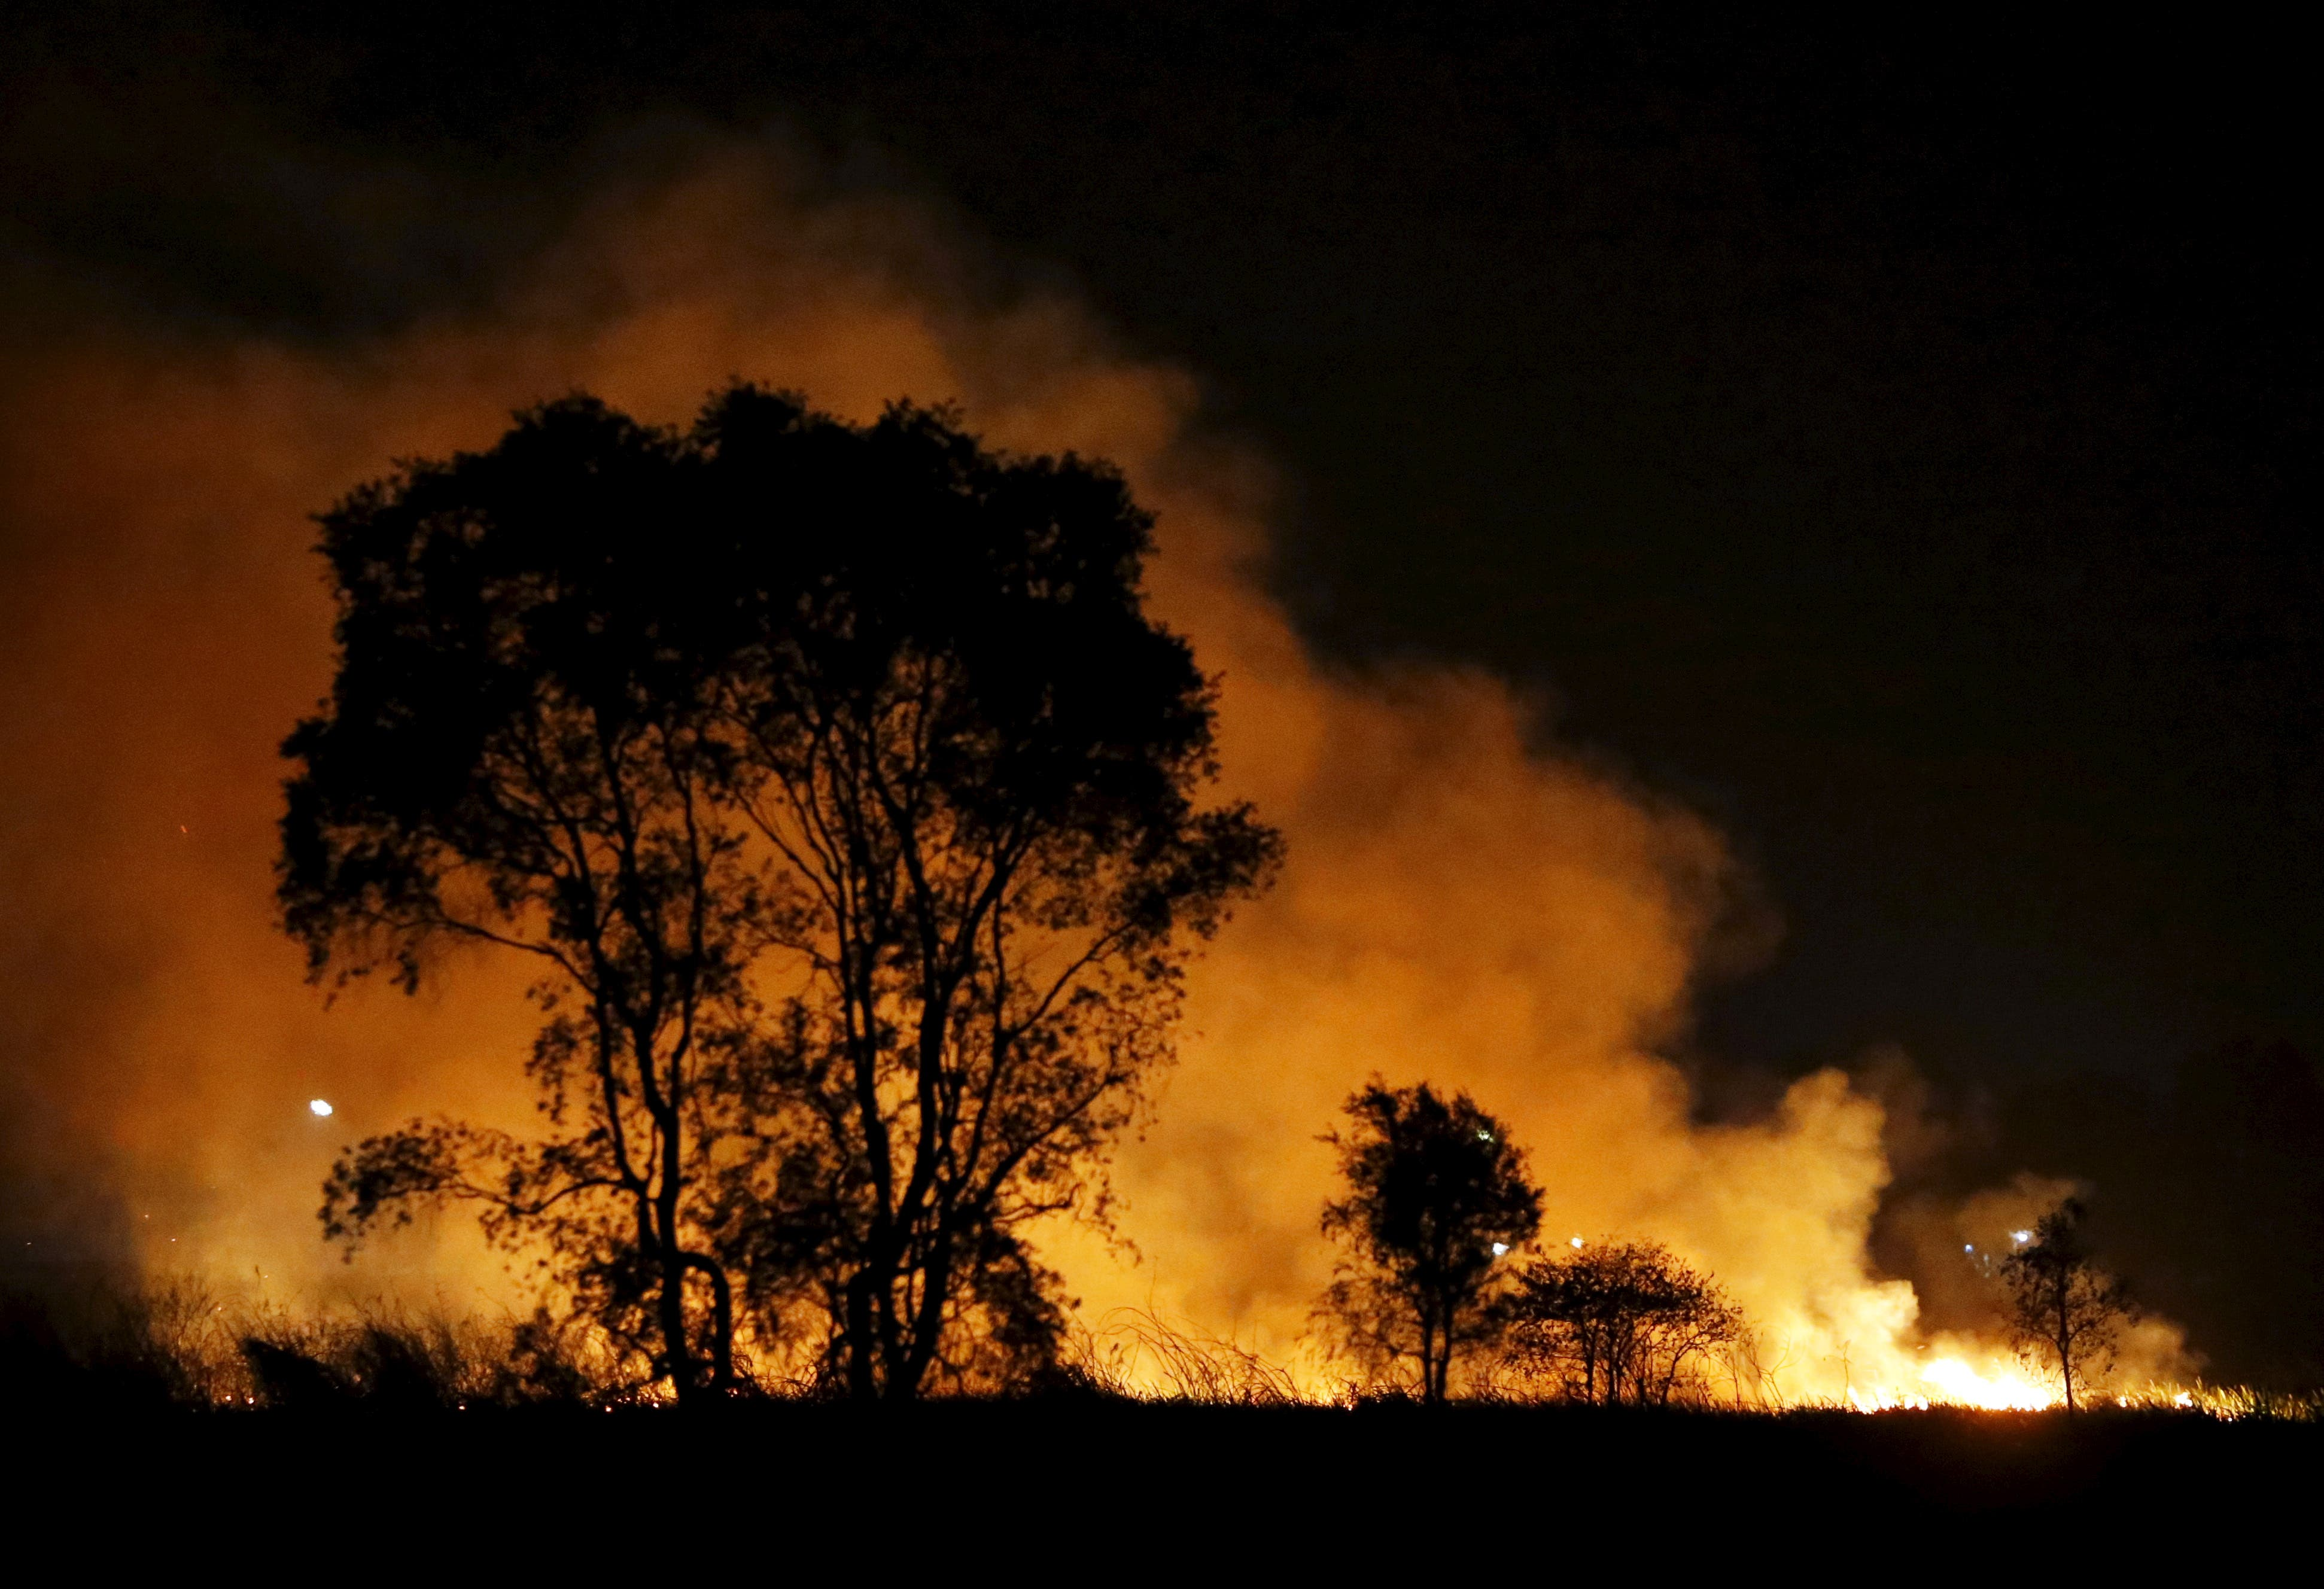 Sumatra fires spread haze in Indonesia